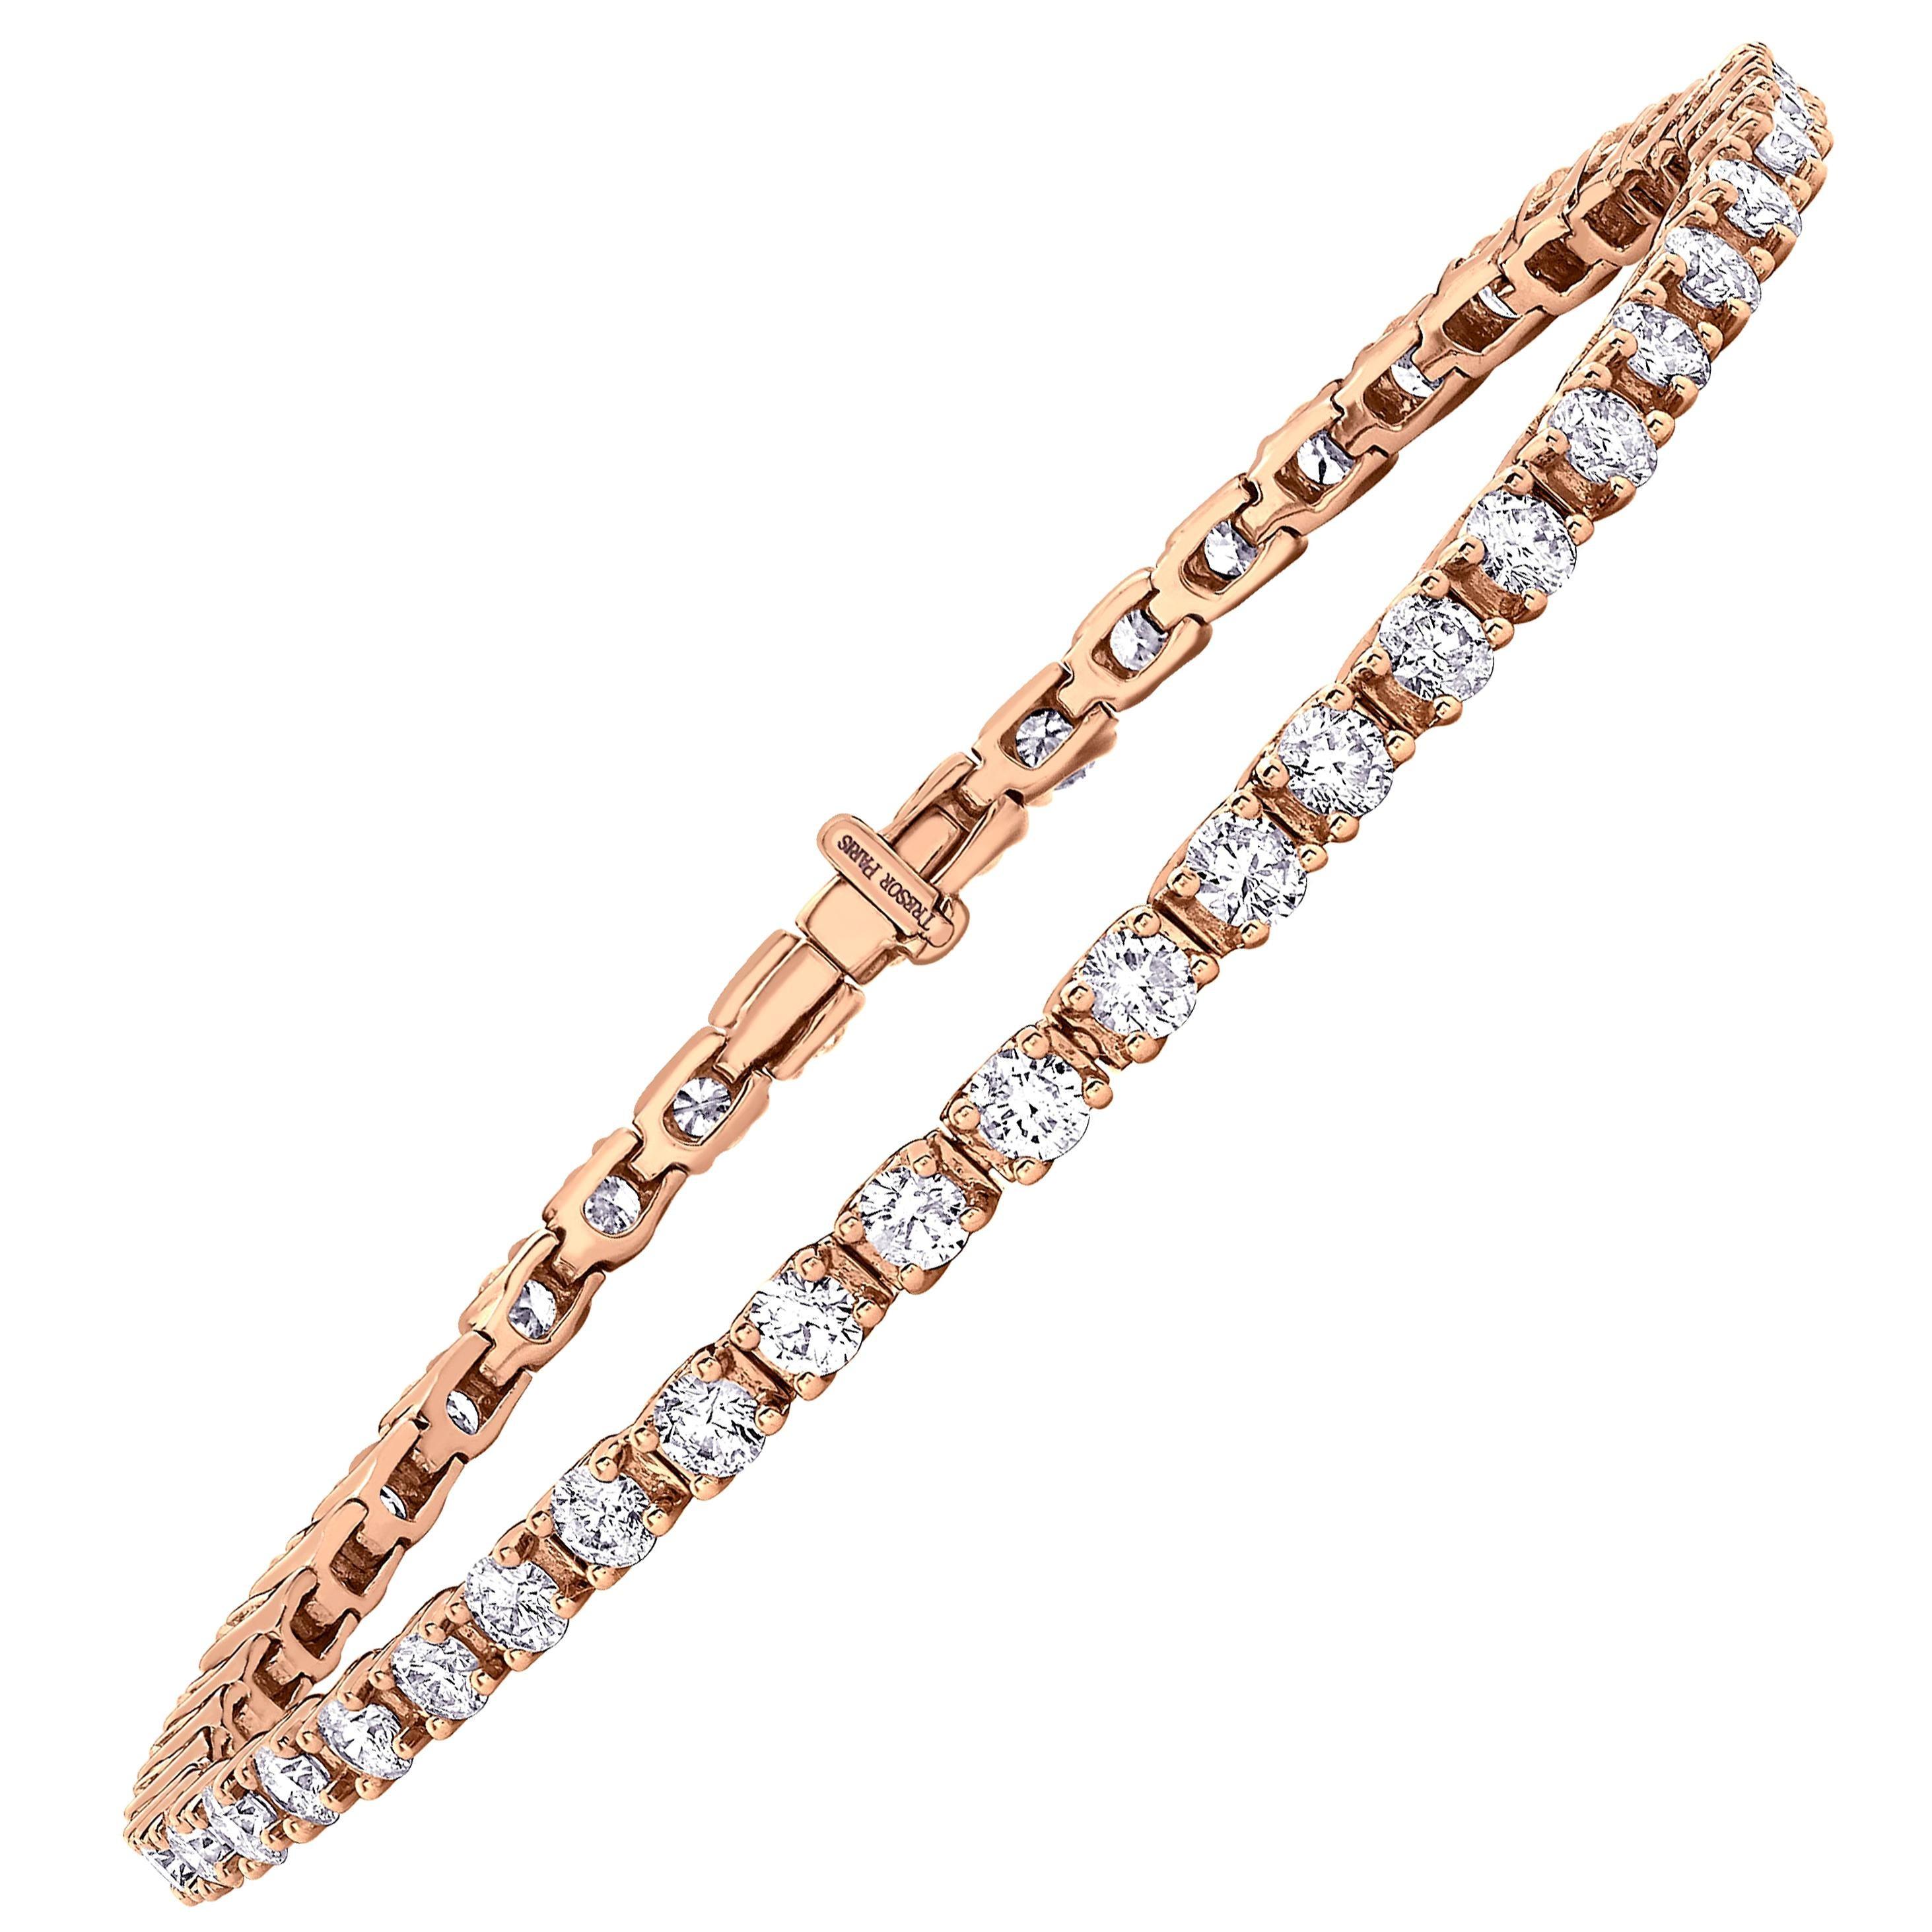 18 Karat Rose Gold 5 Carat Round Diamond Four Claw Tennis Riviera Line Bracelet